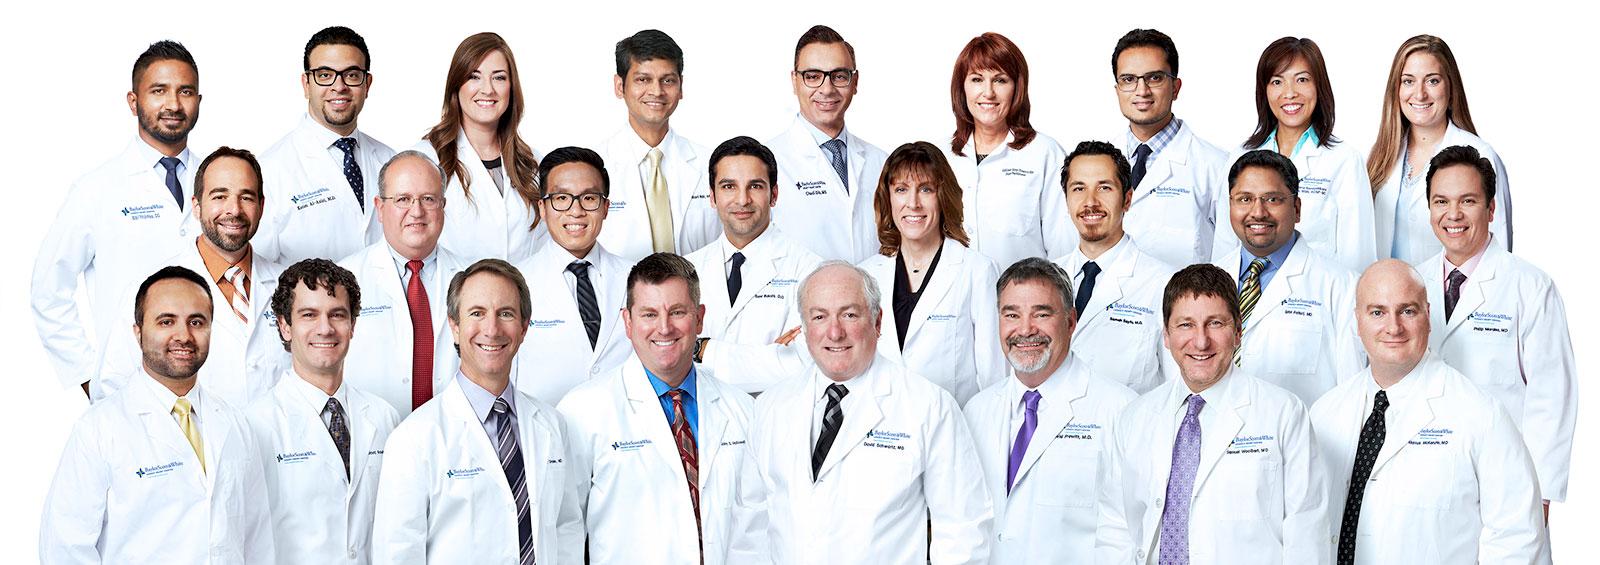 Baylor Scott & White Legacy Heart Center doctors group photo